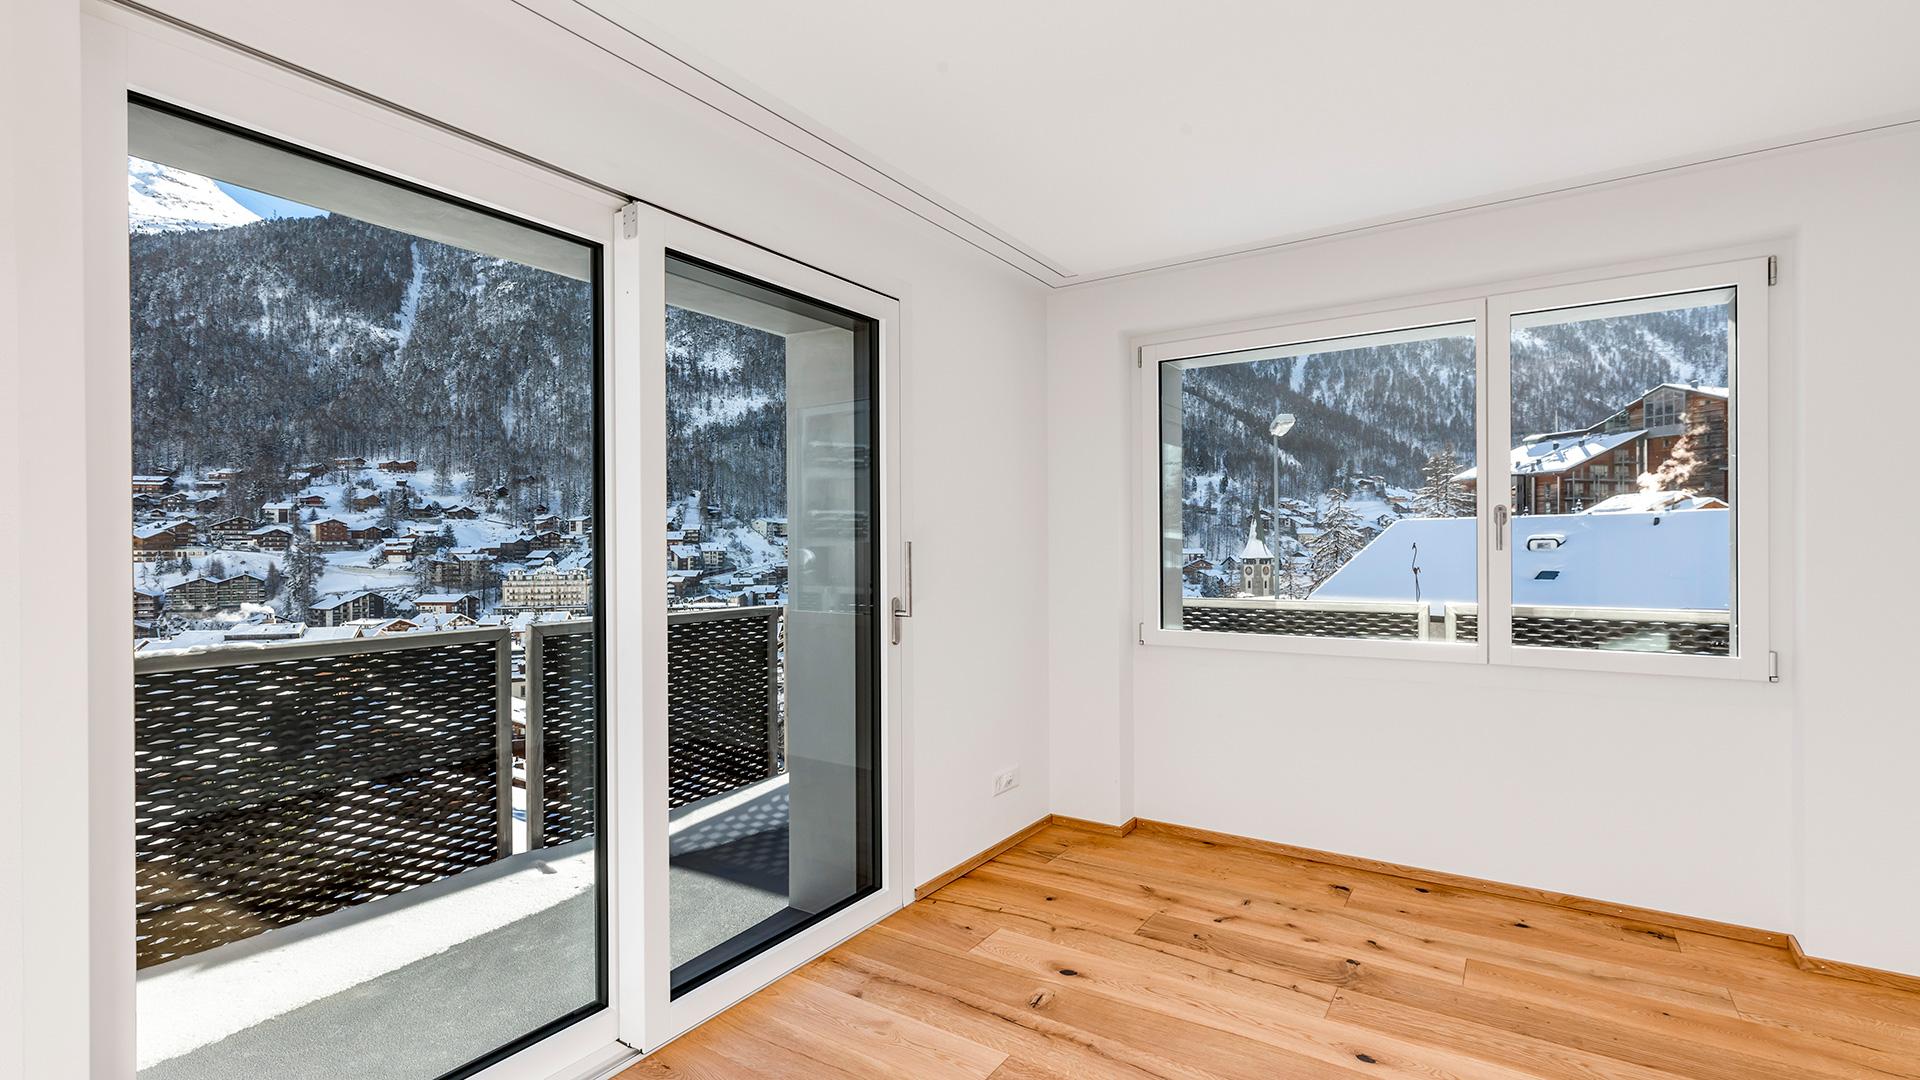 Haus Niklaus 3 Apartments, Switzerland